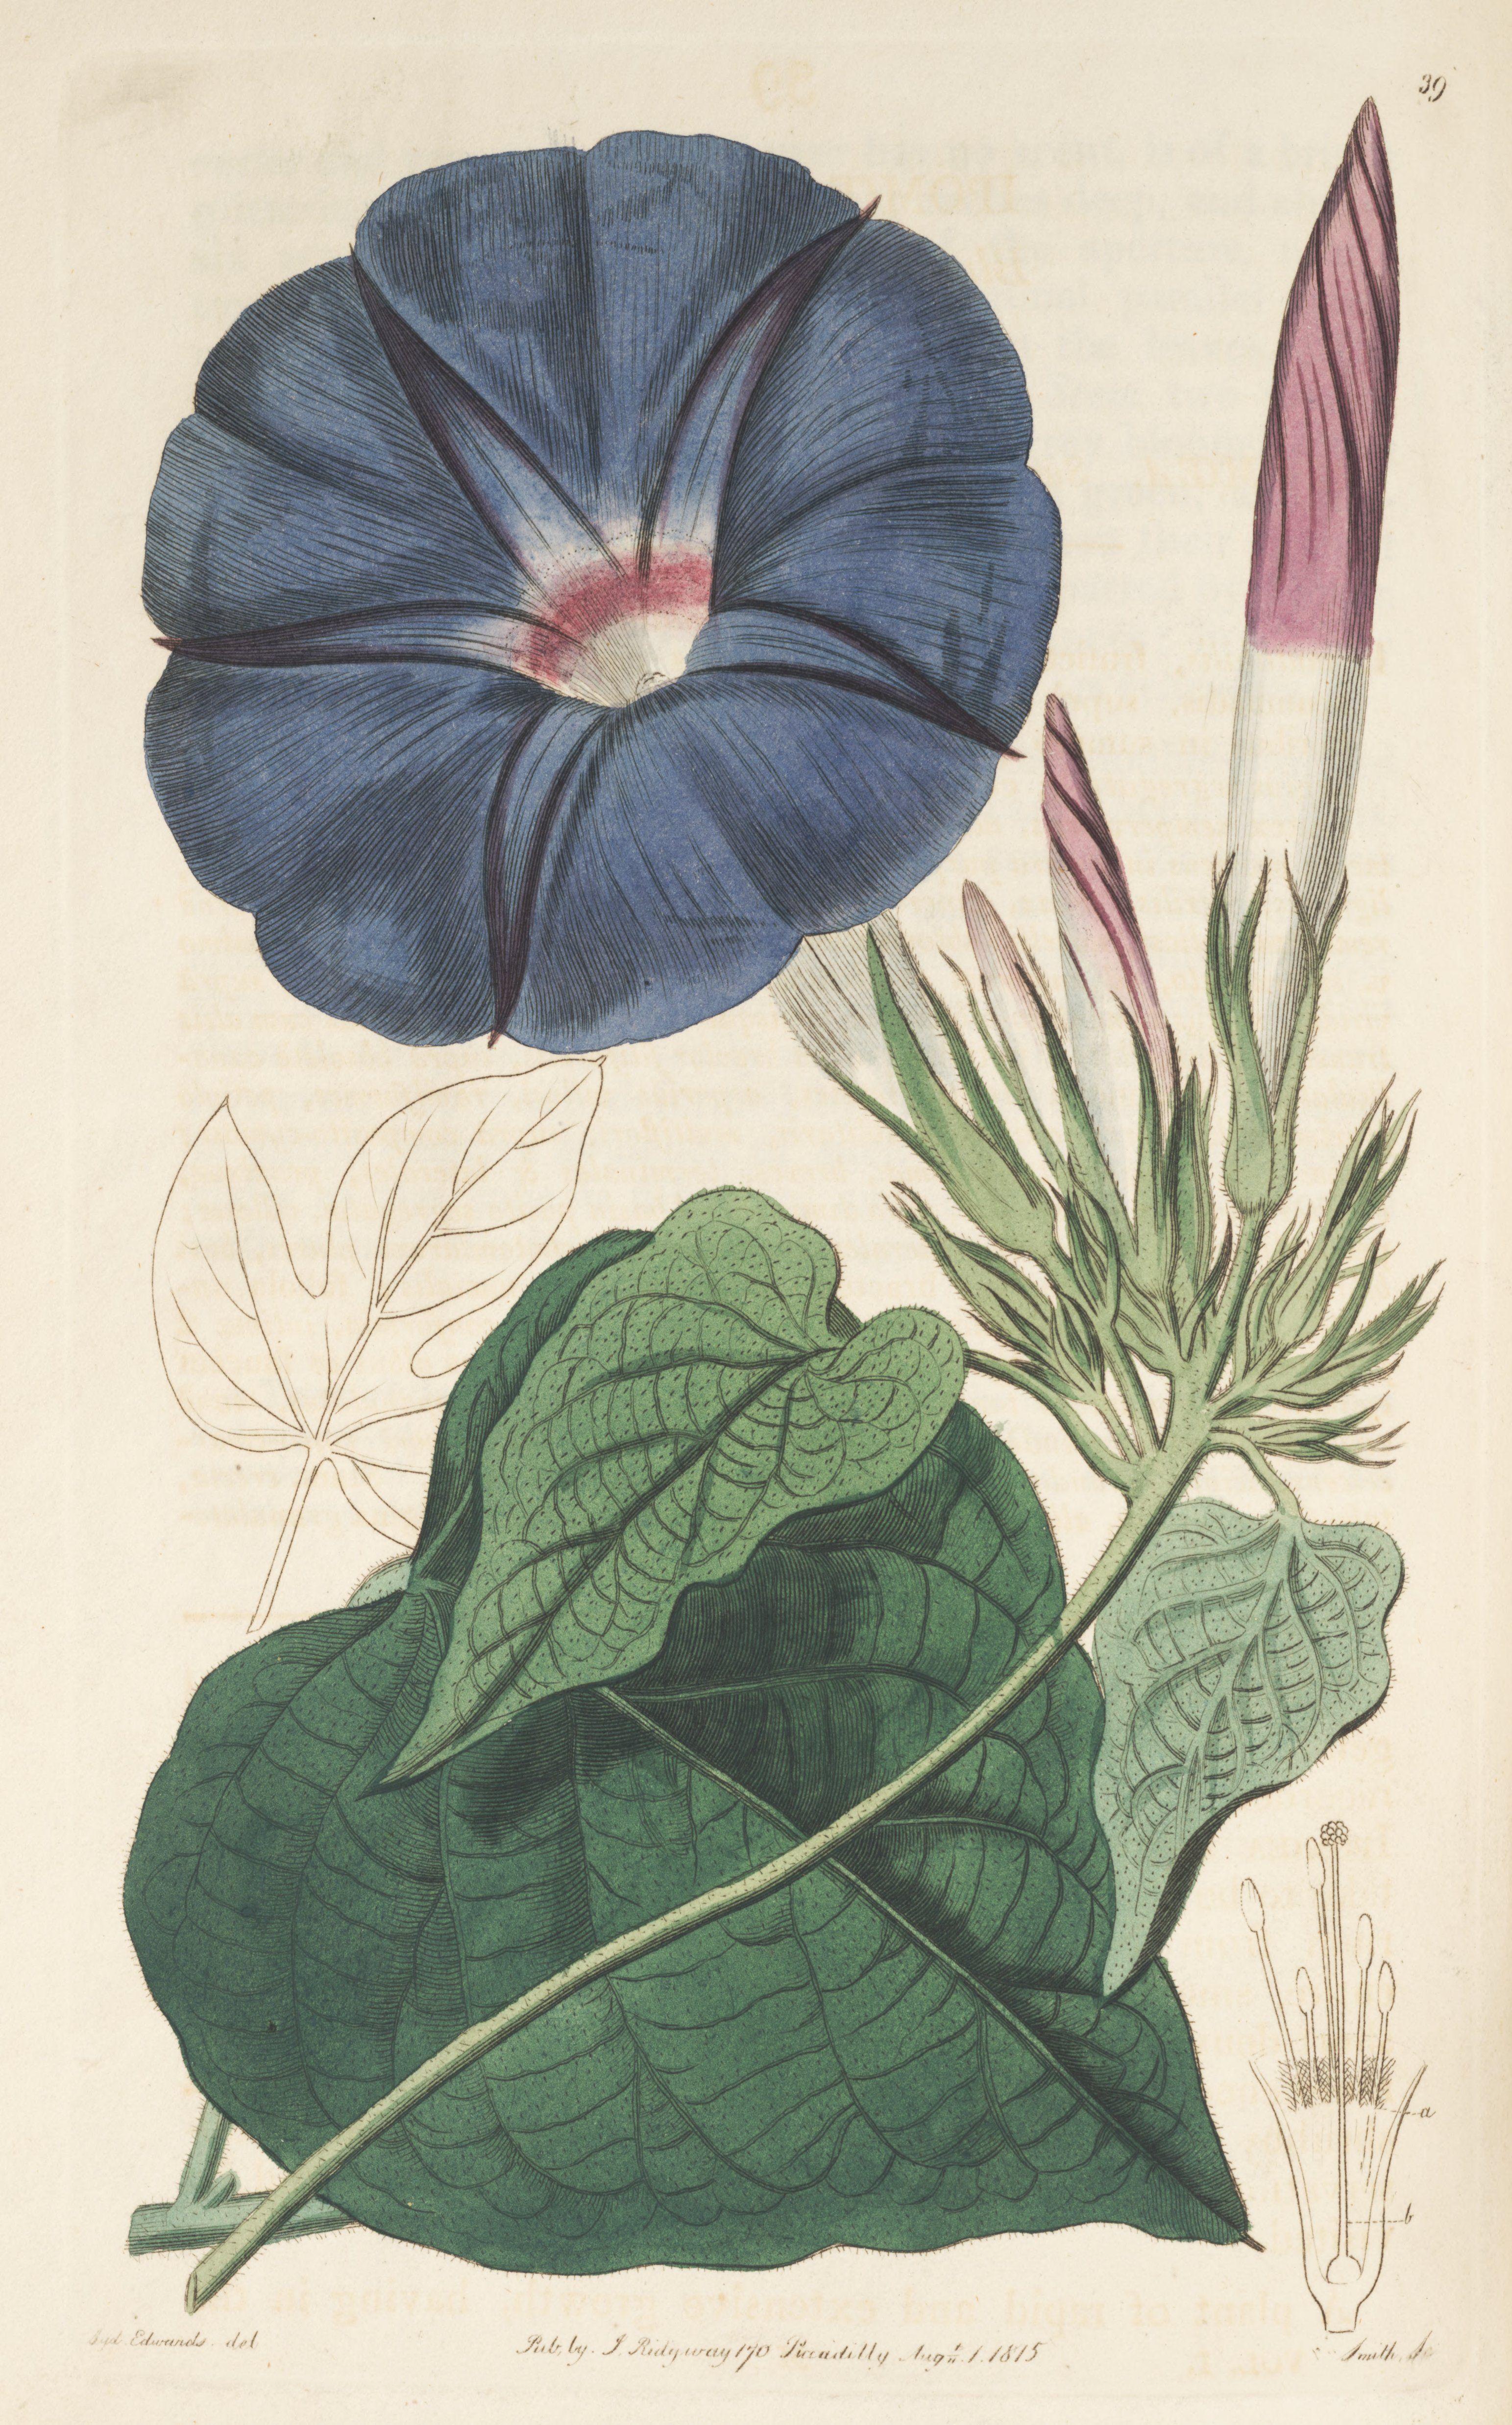 Ipomoea indica burm merr as ipomoea mutabilis ker gawl blue ipomoea indica burm merr as ipomoea mutabilis ker gawl blue dawn flower morning glory botanical register vol 1 t 39 1815 s edwards izmirmasajfo